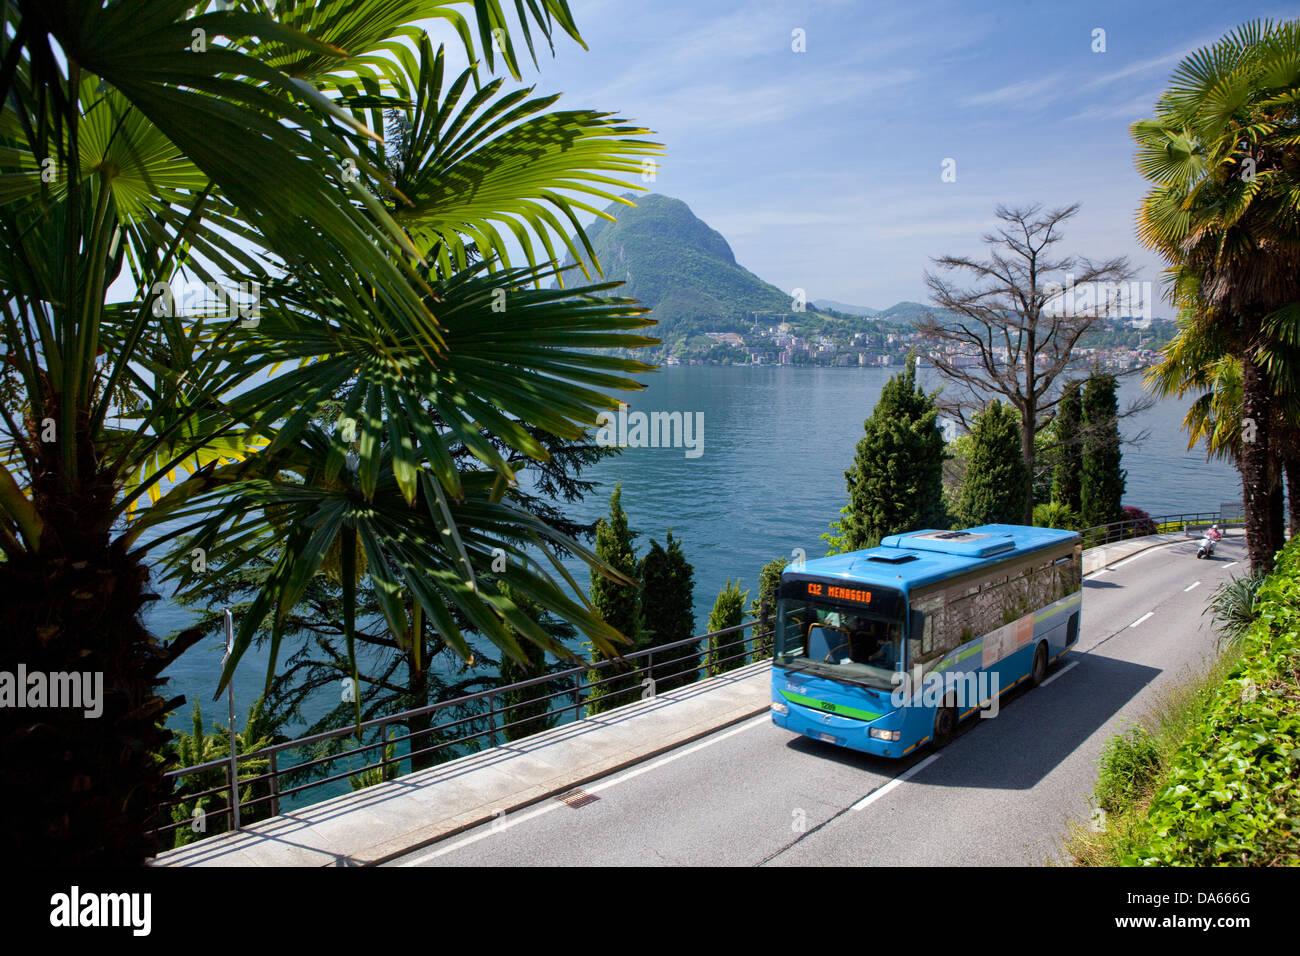 Lugano, canton, TI, Ticino, South Switzerland, town, city, lake, lakes, traffic, transport, Switzerland, Europe, - Stock Image